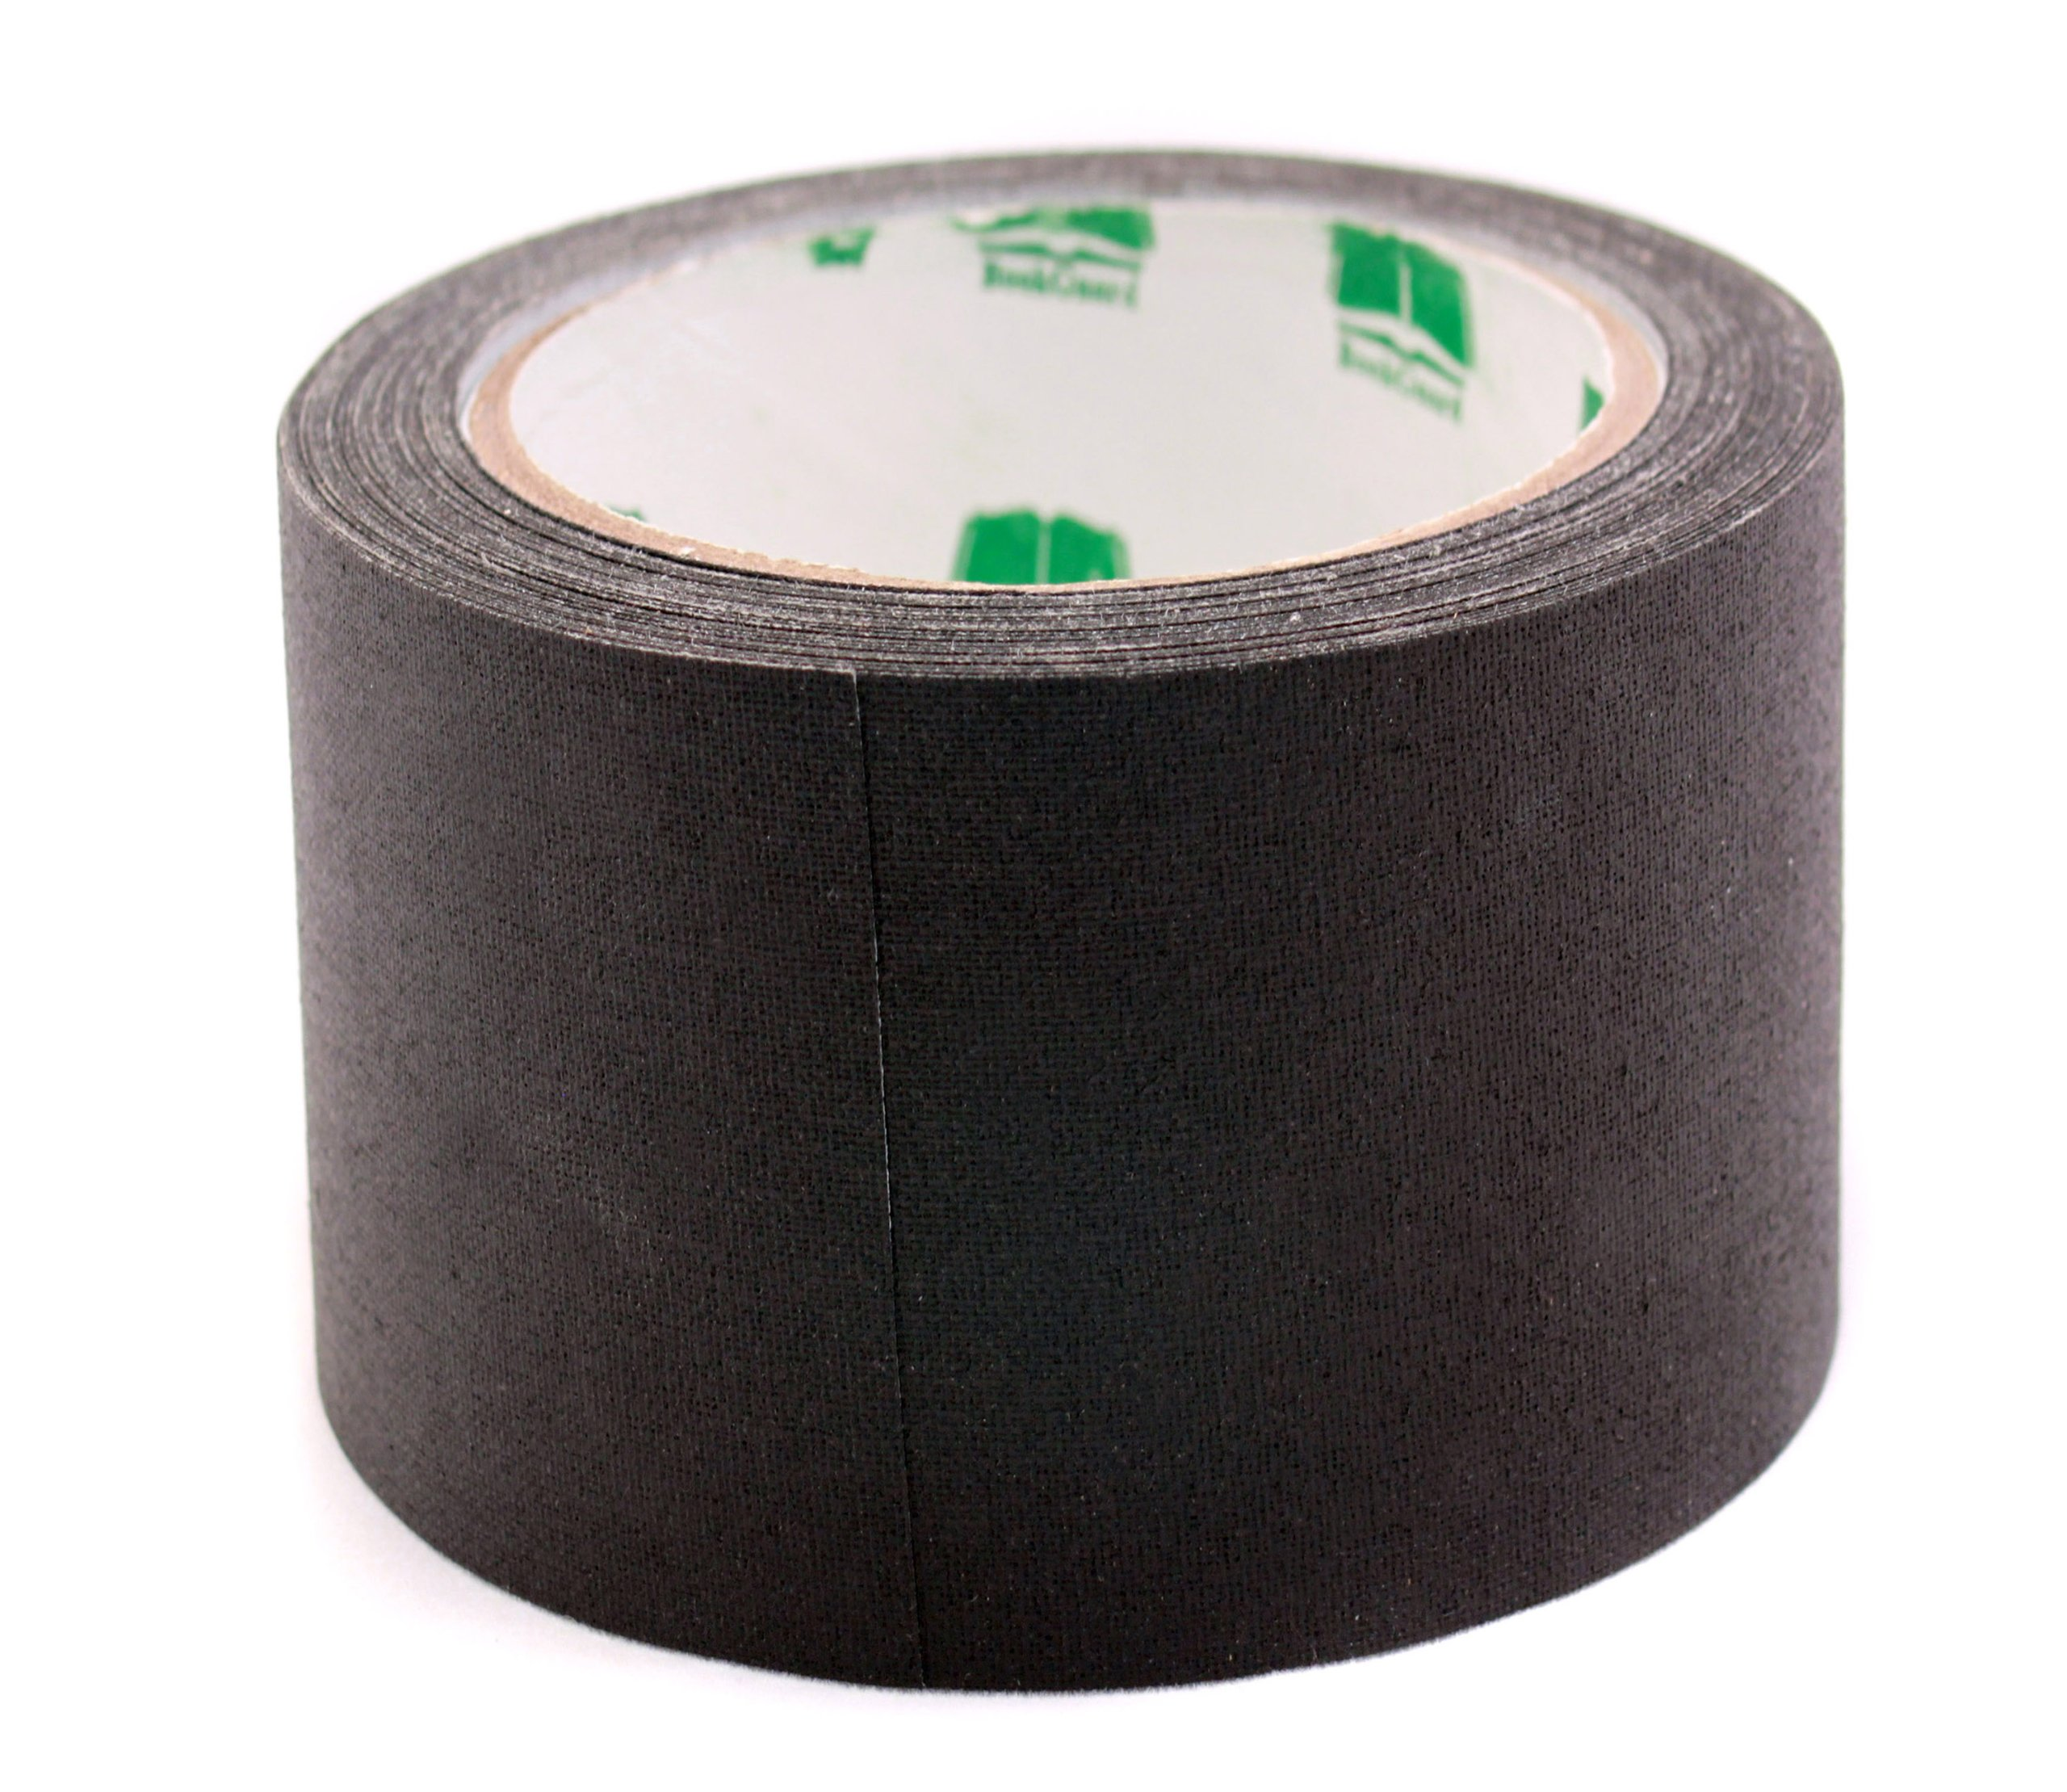 3'' Black Colored Premium-Cloth Book Binding Repair Tape   15 Yard Roll (BookGuard Brand)